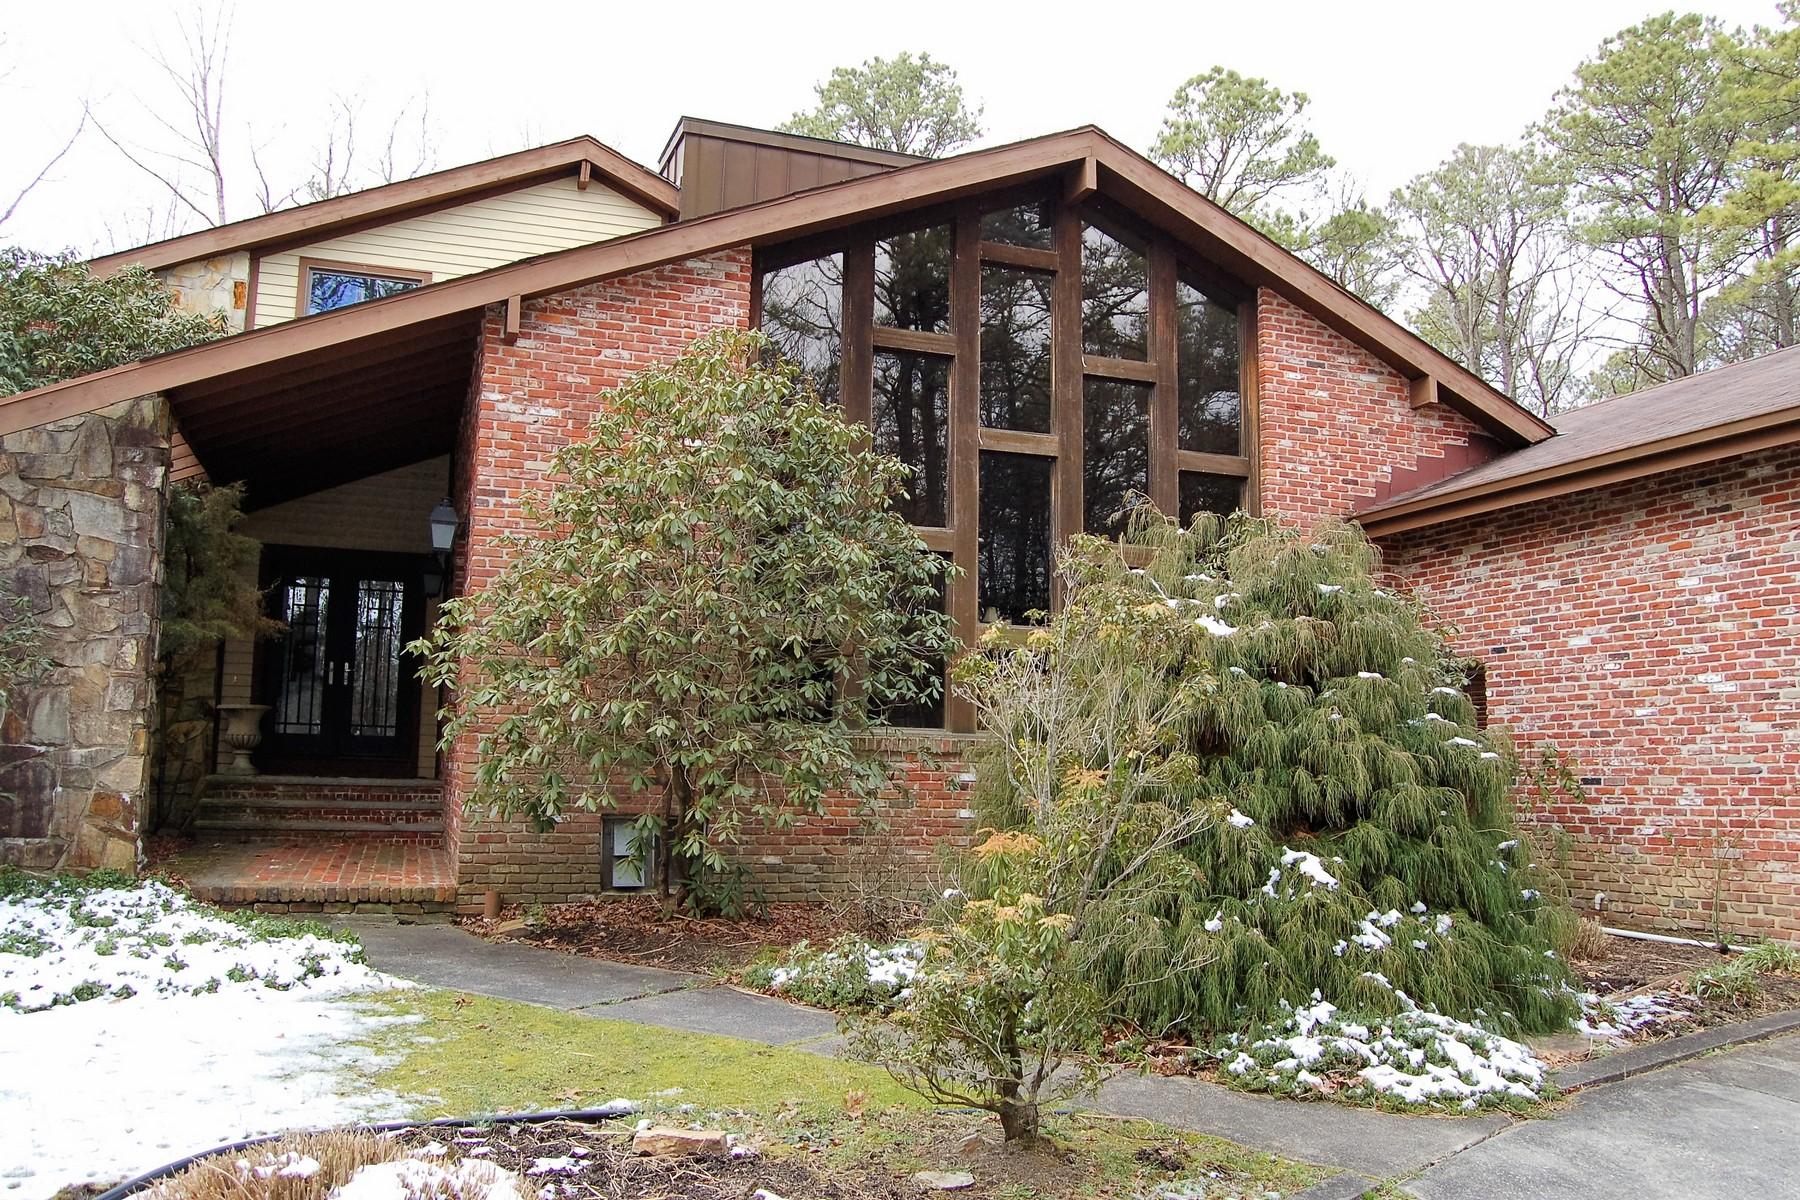 Maison unifamiliale pour l Vente à Custom Home in a Private Setting 113 E Great Creek Road Galloway, New Jersey 08205 États-Unis